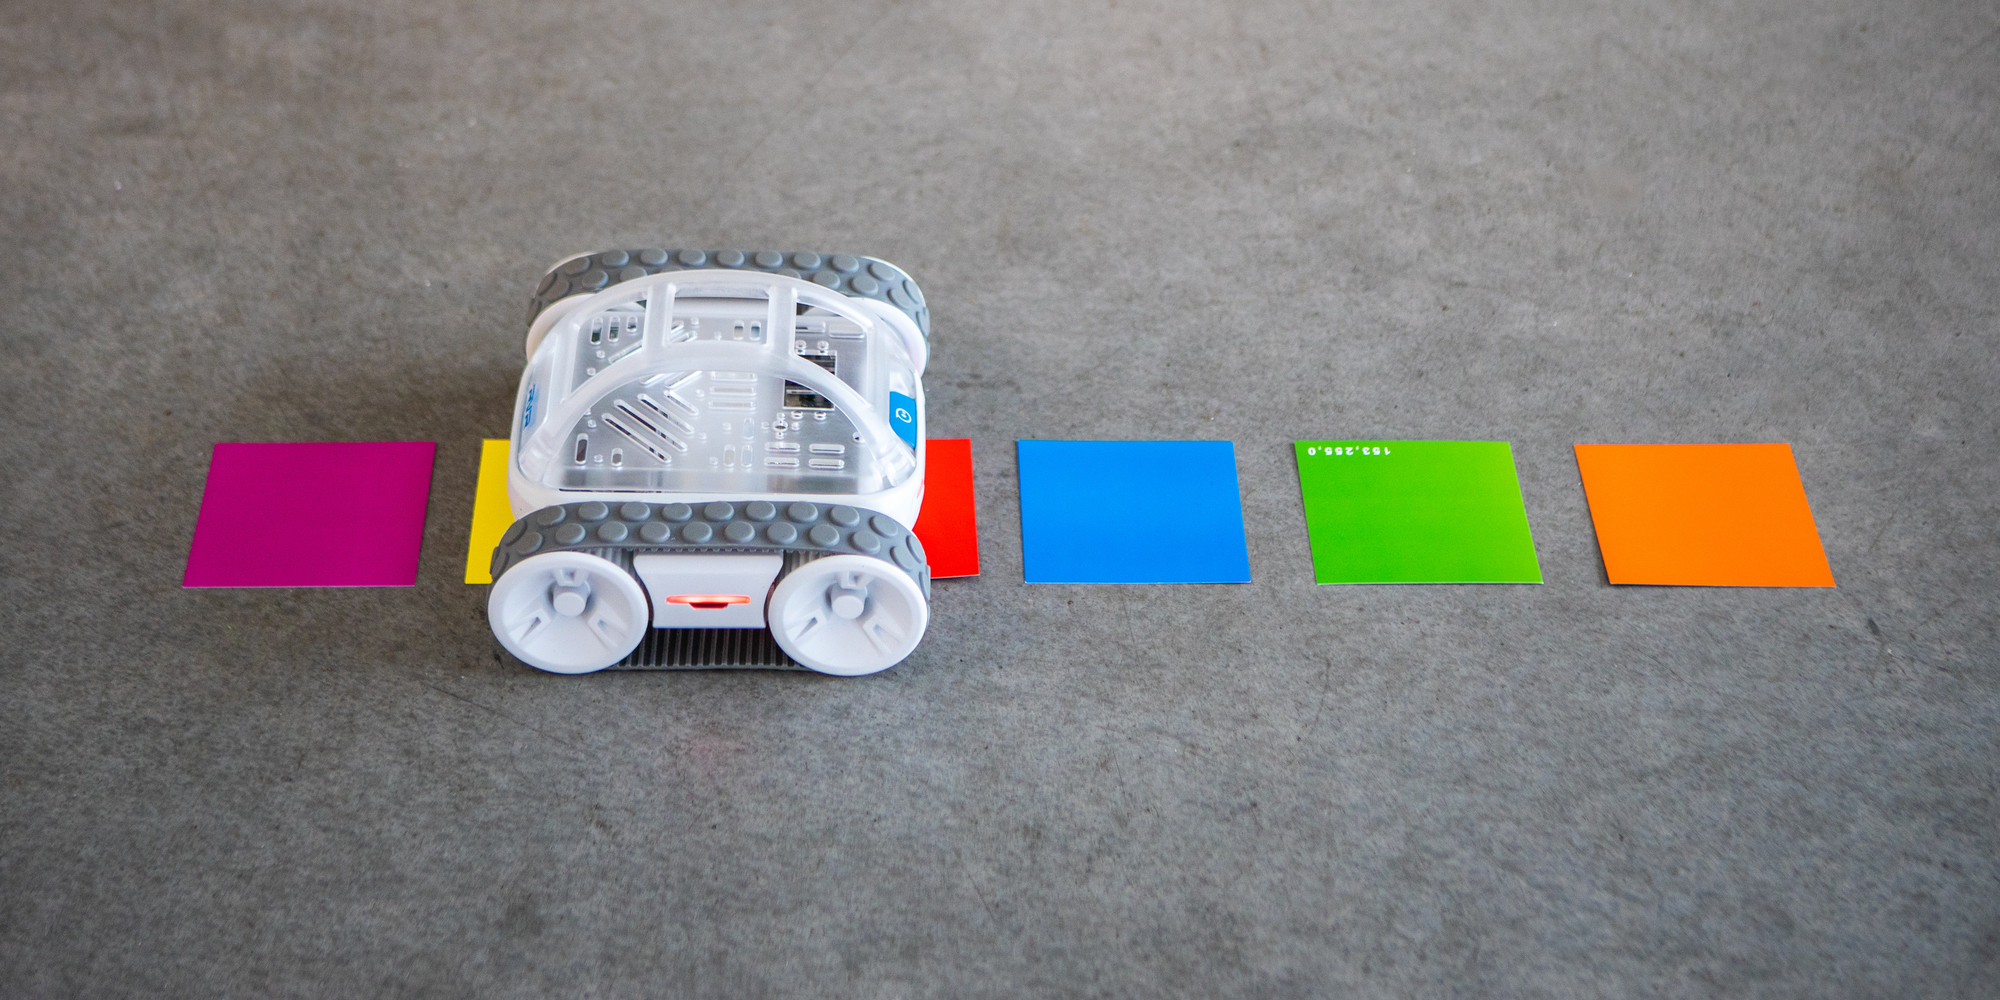 Sphero RVR color sensing